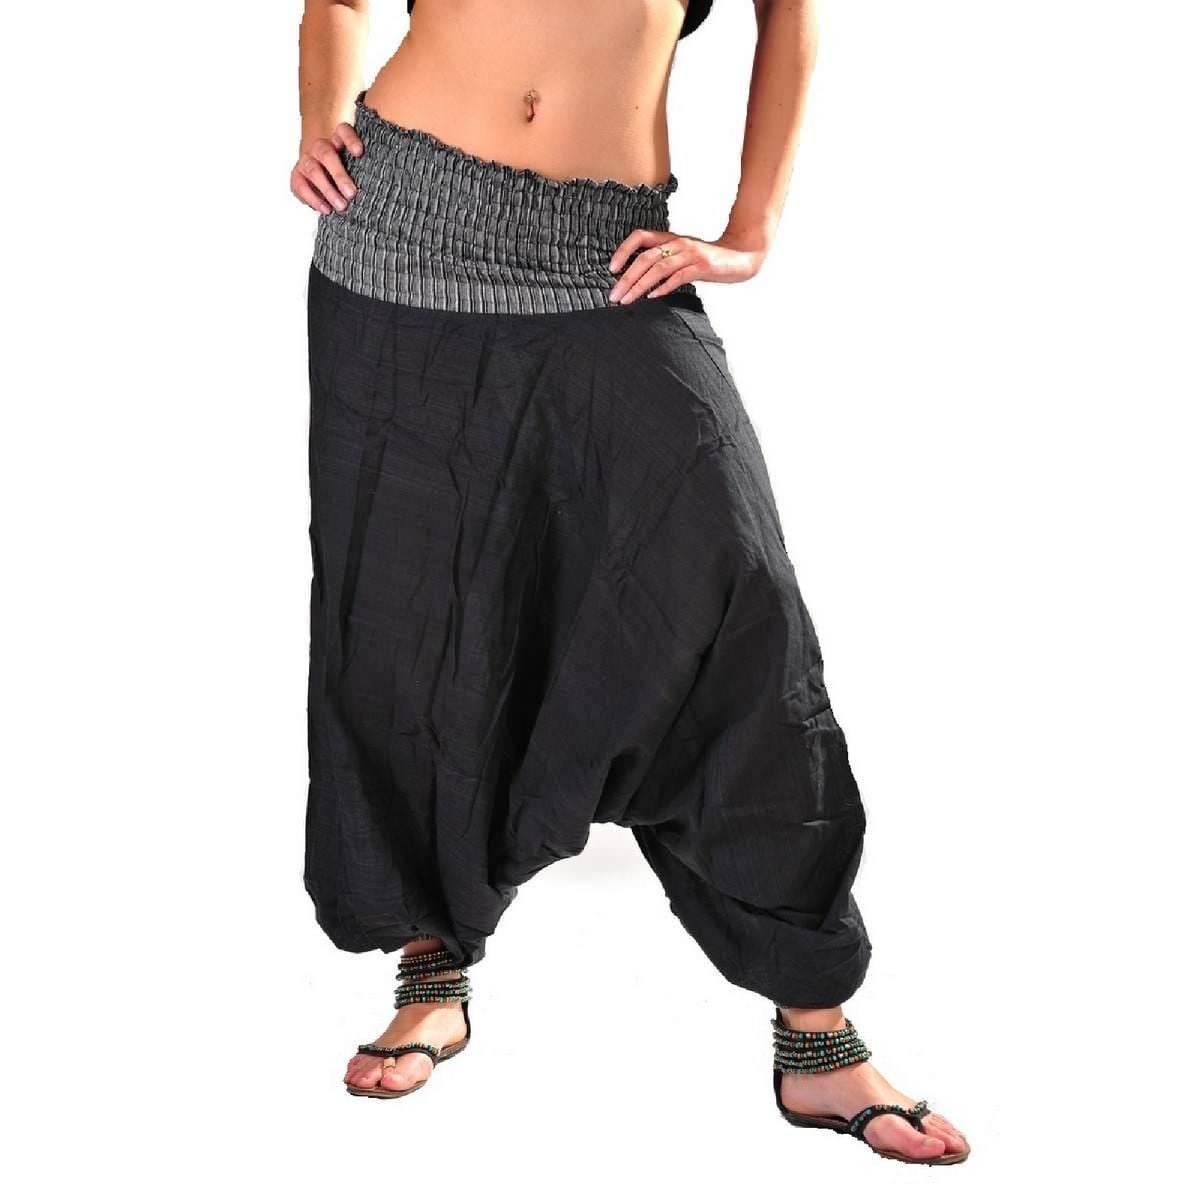 Sarouel Hose GOA Aladin Haremshose HIPPIE Psy BOHO Yoga Pluderhose Taschen GRÜN